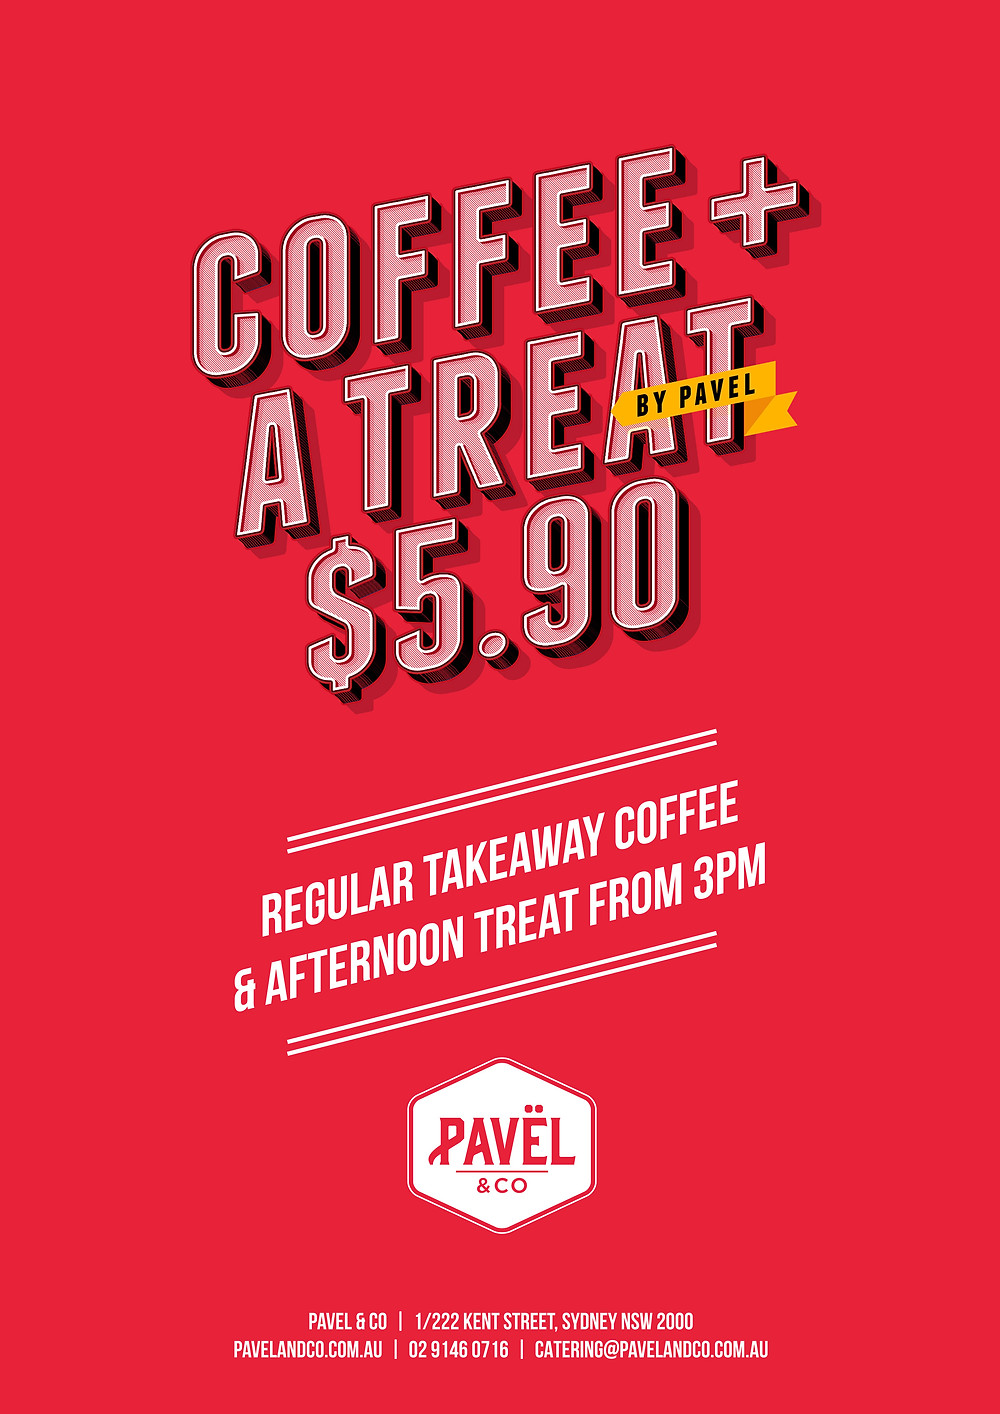 Pavel_Coffee_Treat.jpg